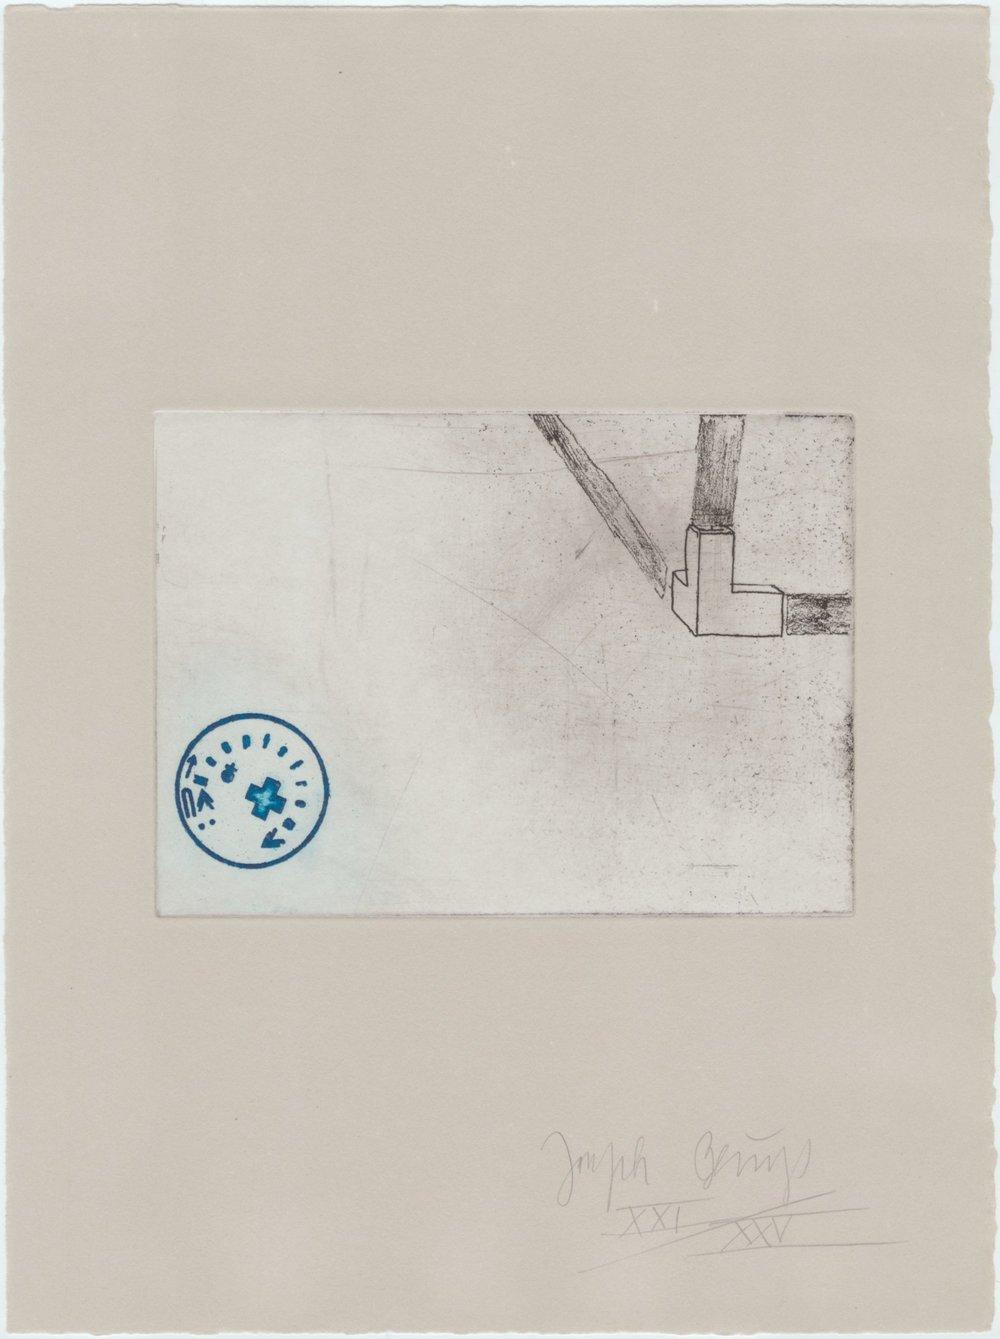 Zirkulationszeit-Raumecke, Filz, Fett XXV / XXV (Museumsausgabe, Radierung auf Rives gris) 1982